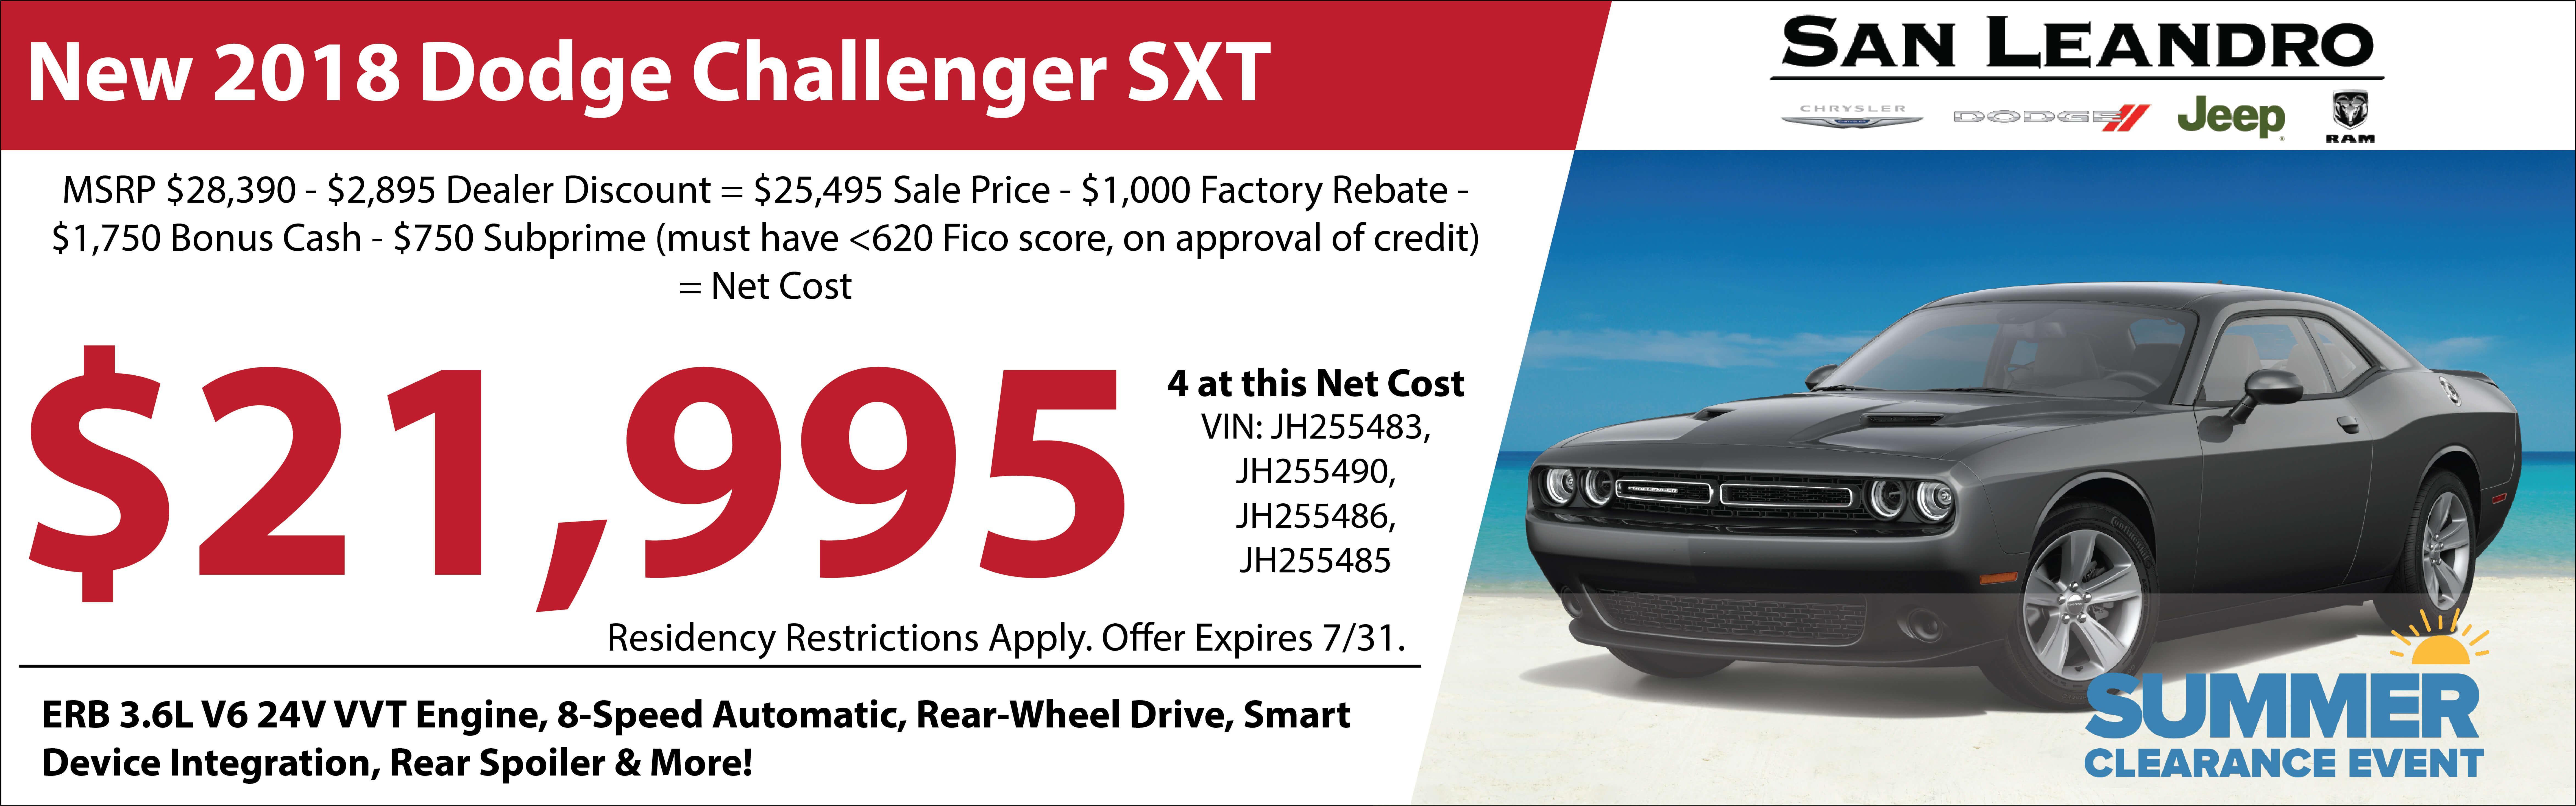 San Leandro Chrysler Dodge Jeep Ram Dealership New & Used Auto